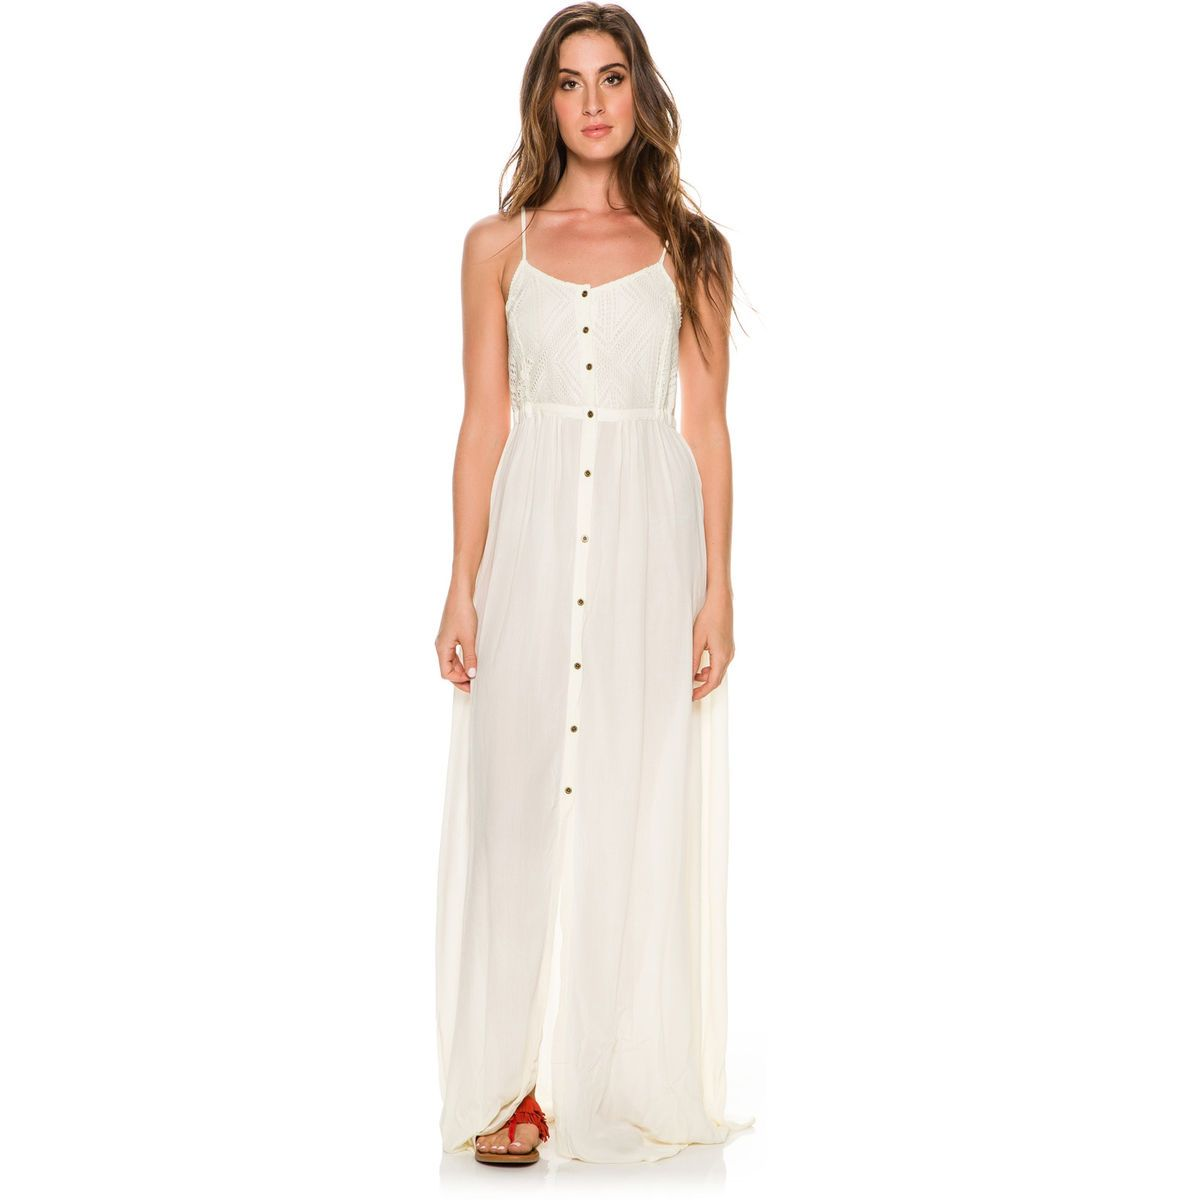 Press bianca french terry maxi dress